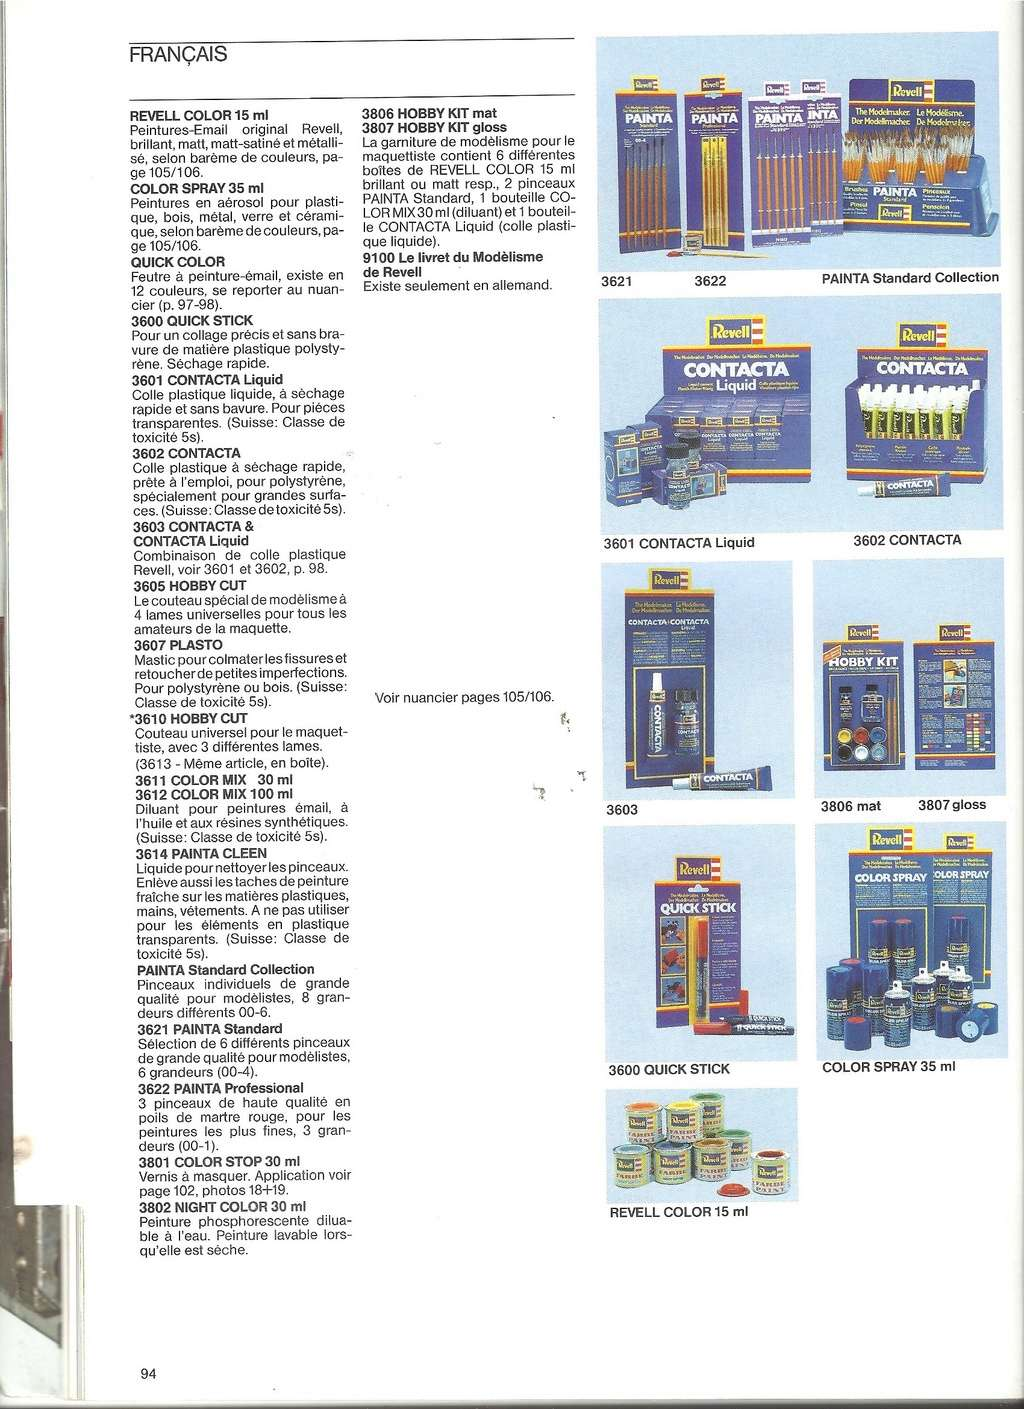 1984 - [REVELL 1984] Catalogue 1984  Revel214